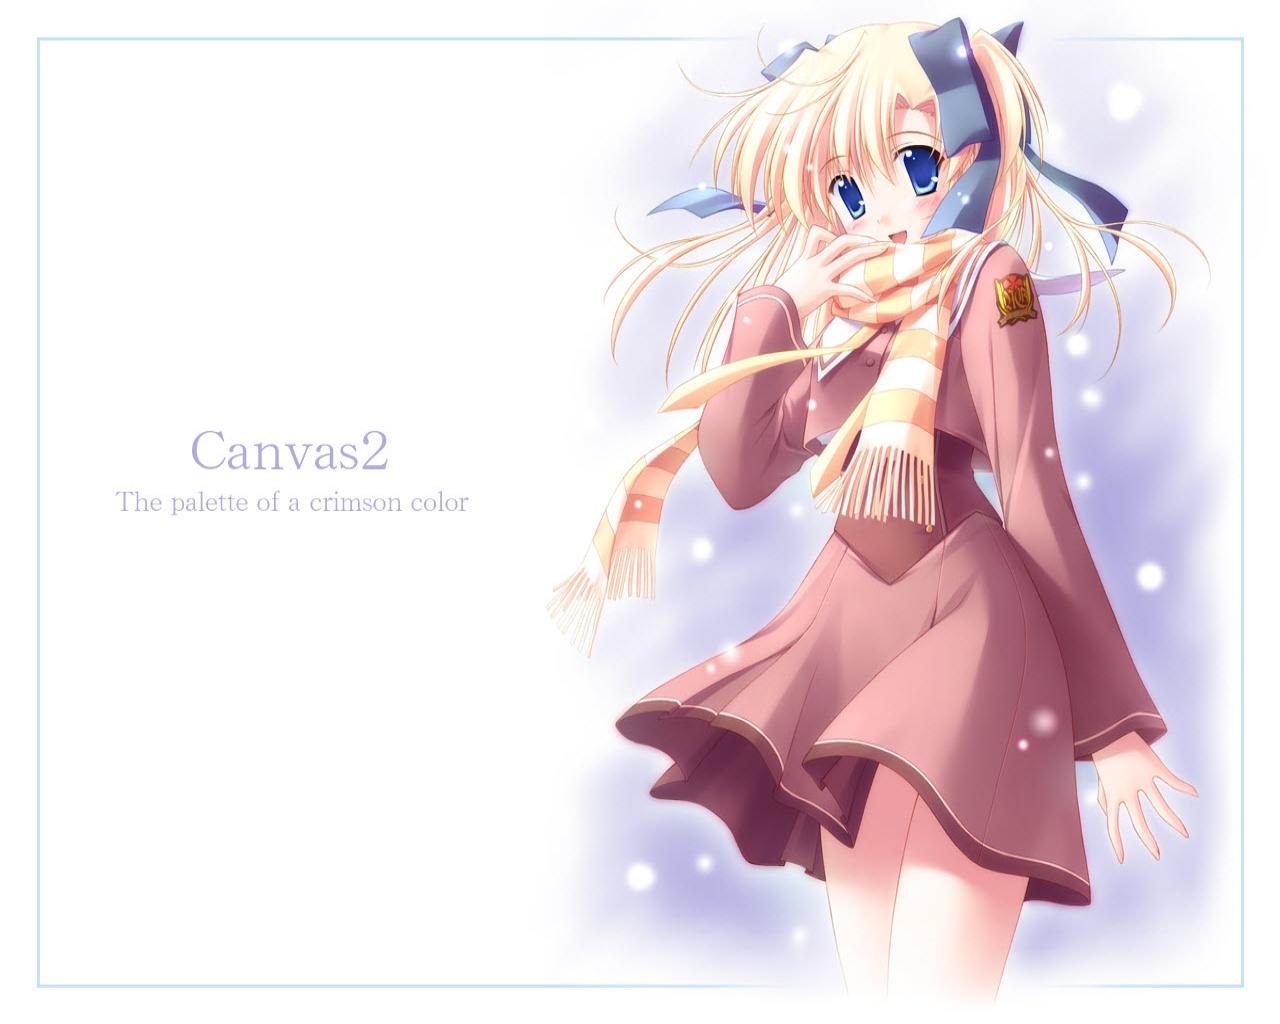 http://3.bp.blogspot.com/_V6TVDECge74/TCEcMuYNgsI/AAAAAAAAAko/OpqR3GMVYbE/s1600/anime_girl_wallpaper%252B.jpg